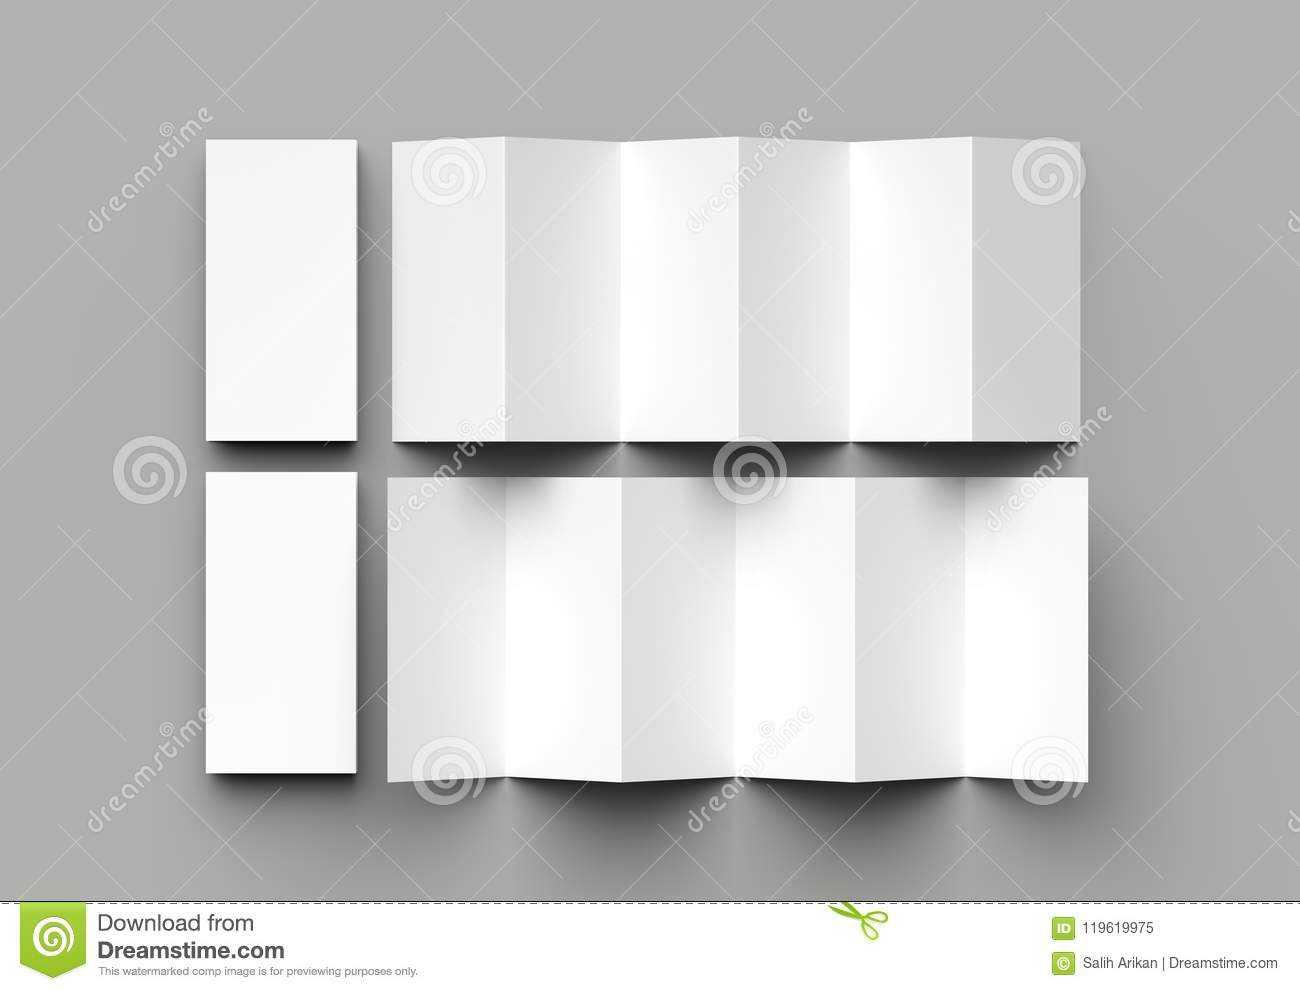 6 Panel Brochure Template - Karan.ald2014 For 6 Panel Brochure Template